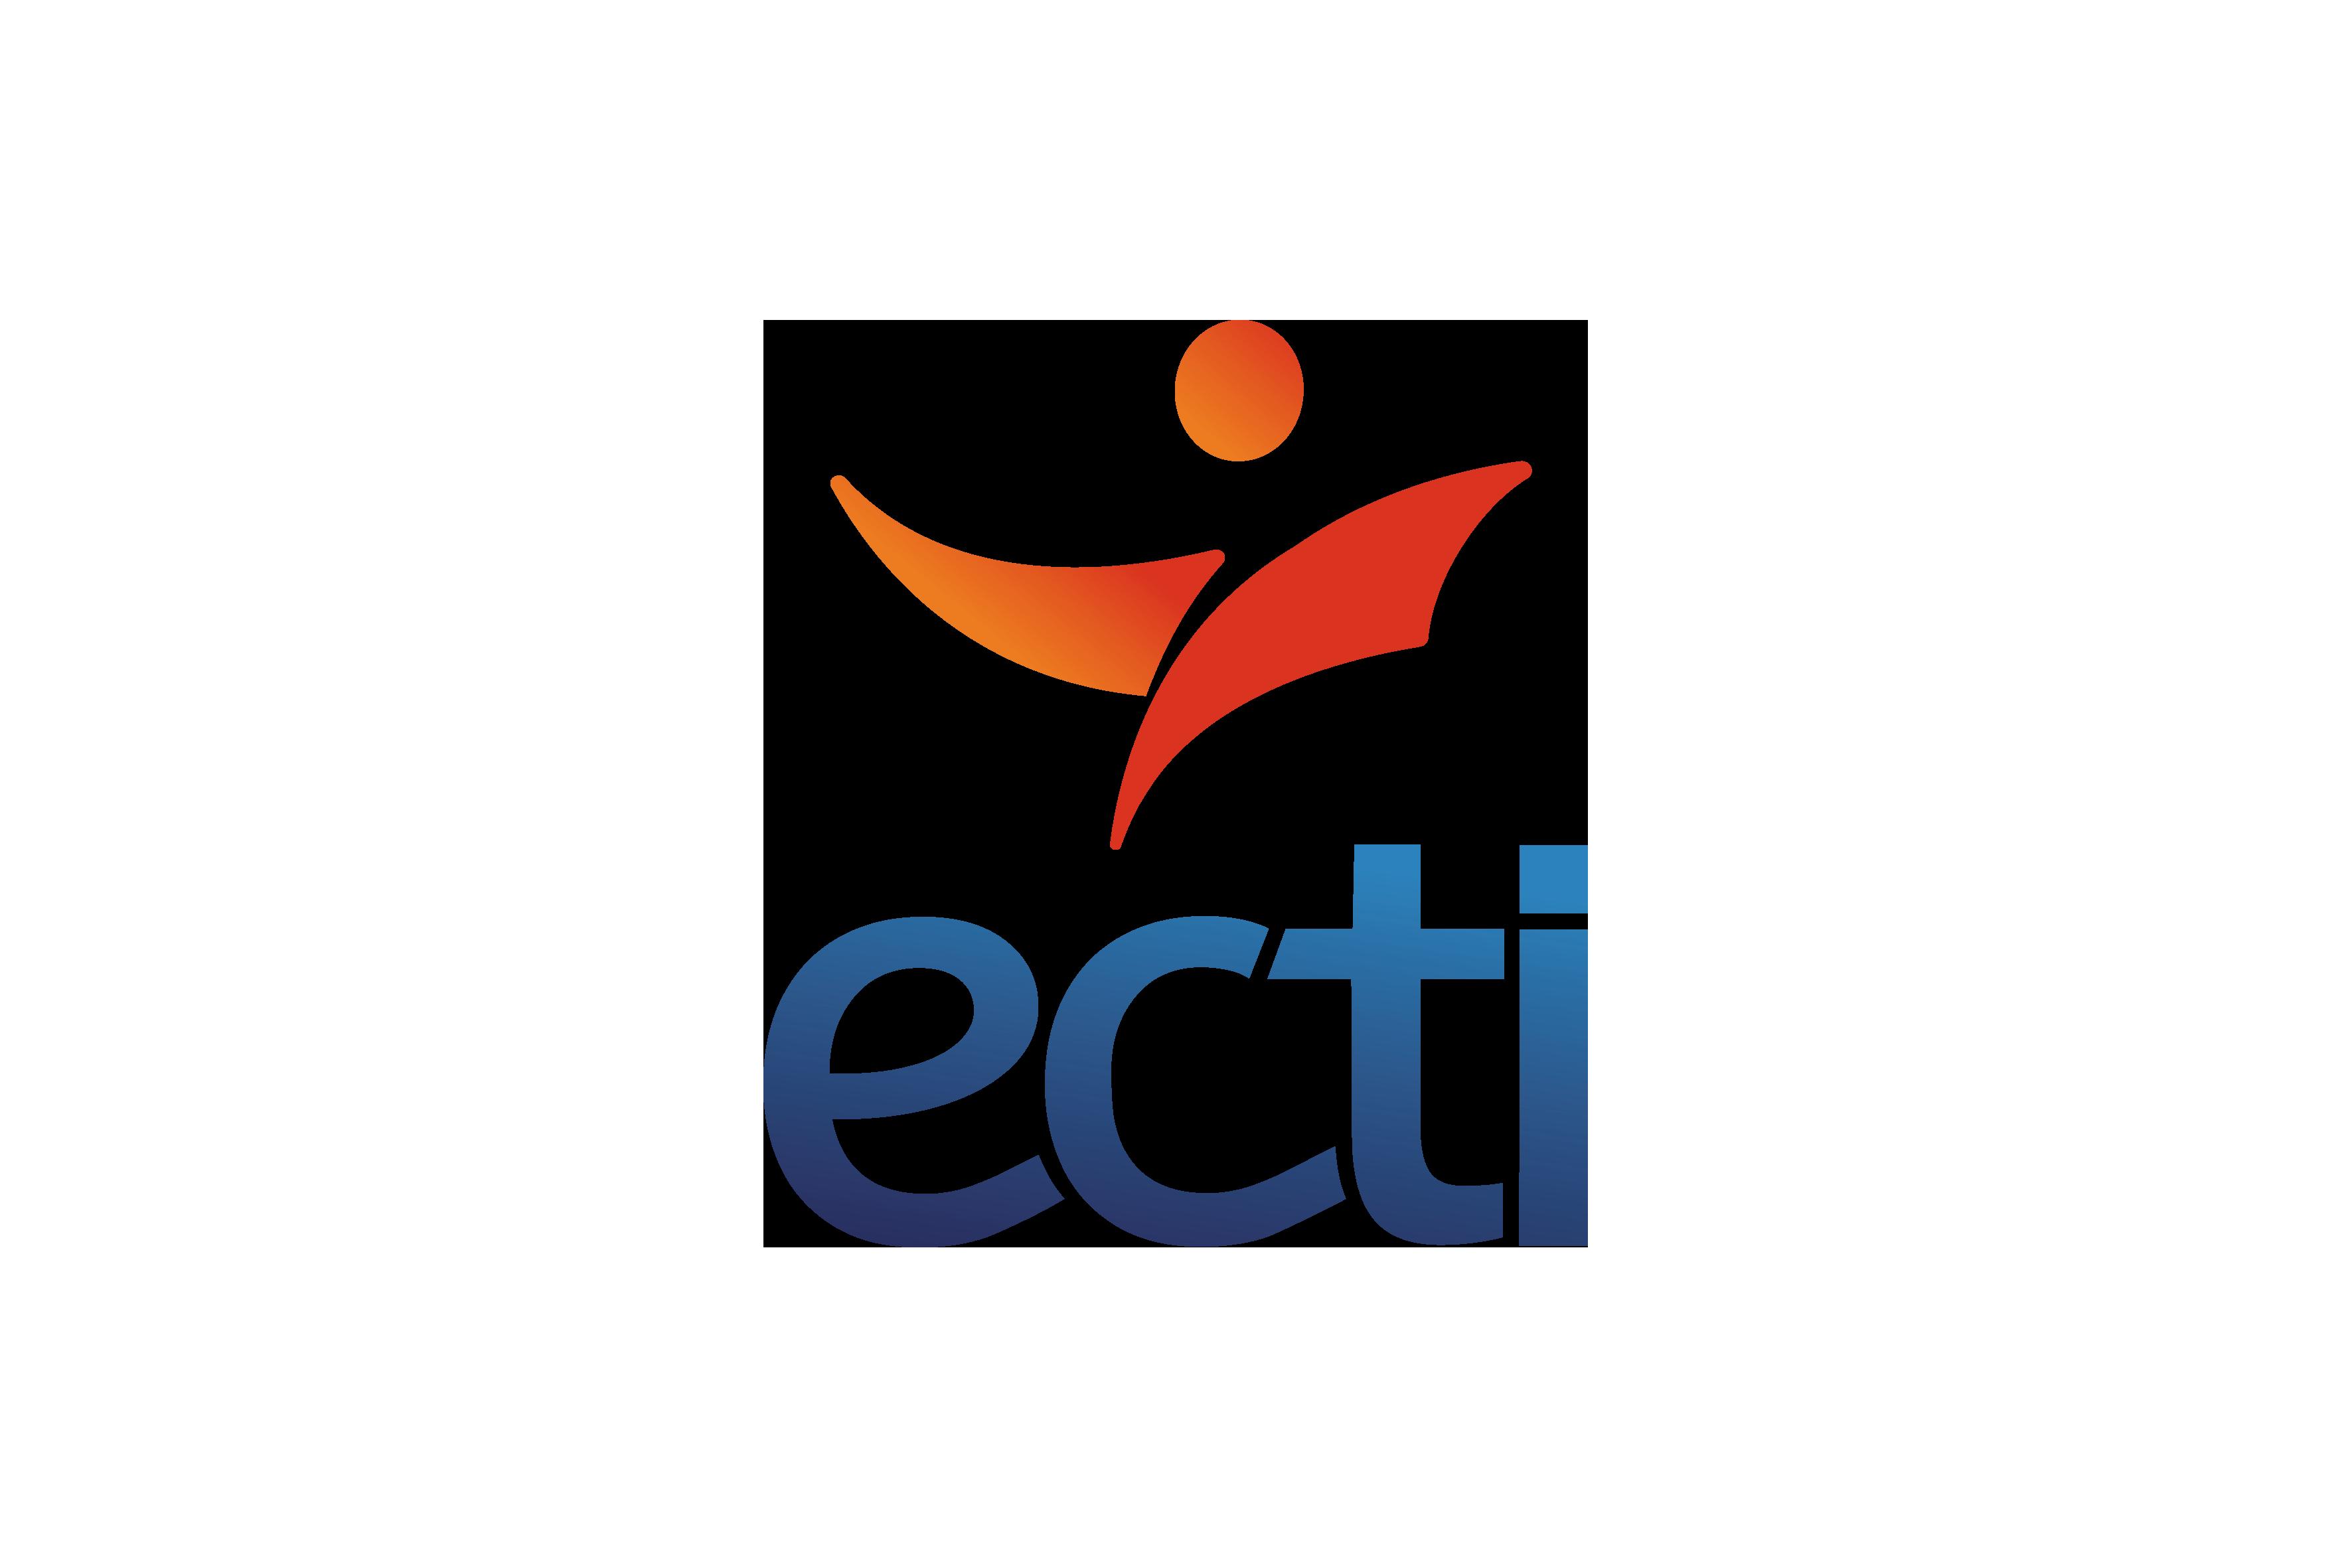 ECTI Ille-et-Vilaine